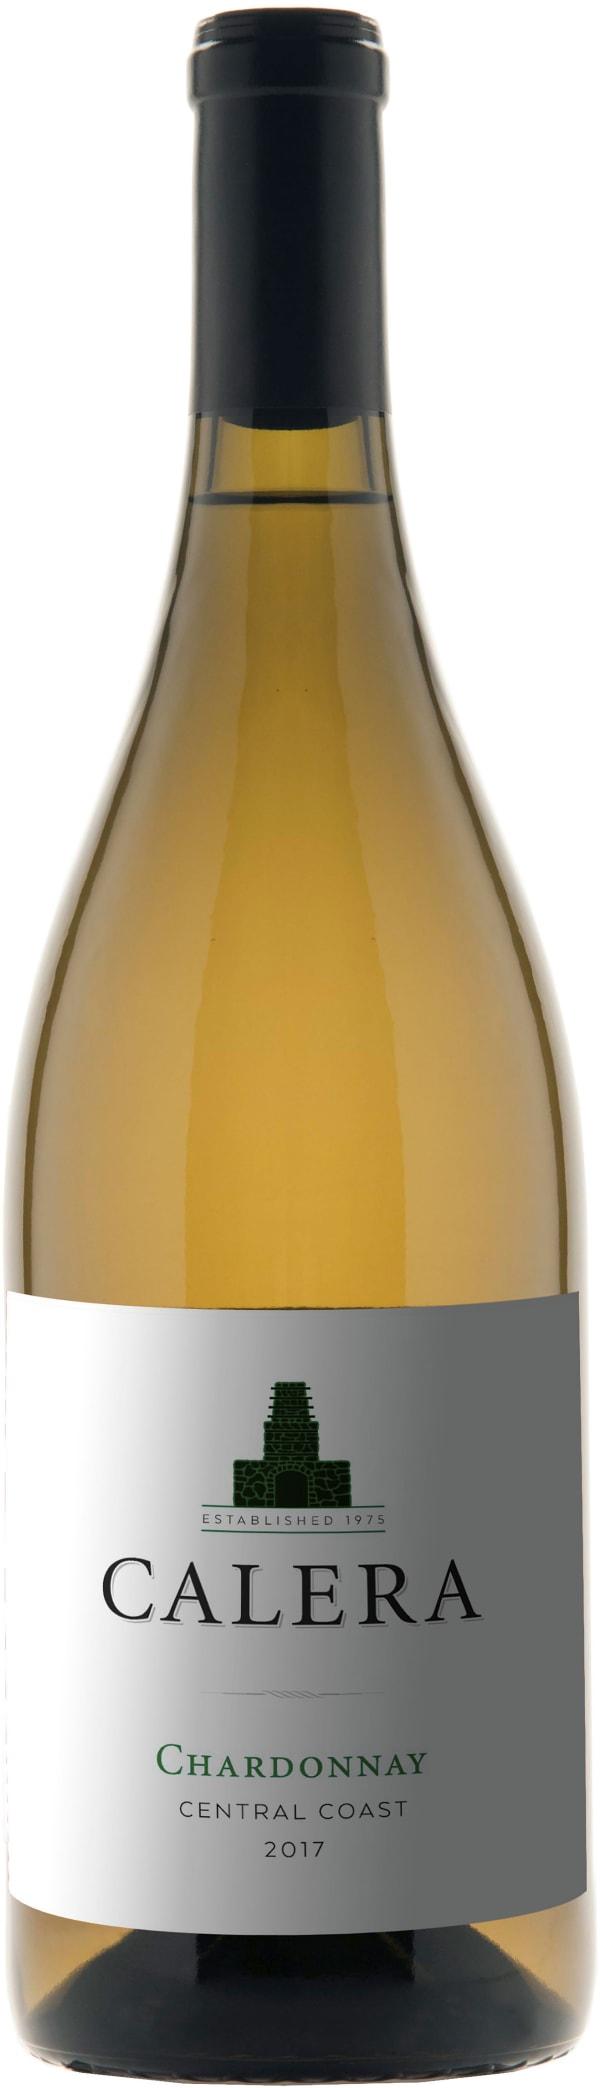 Calera Mt. Harlan Chardonnay 2017